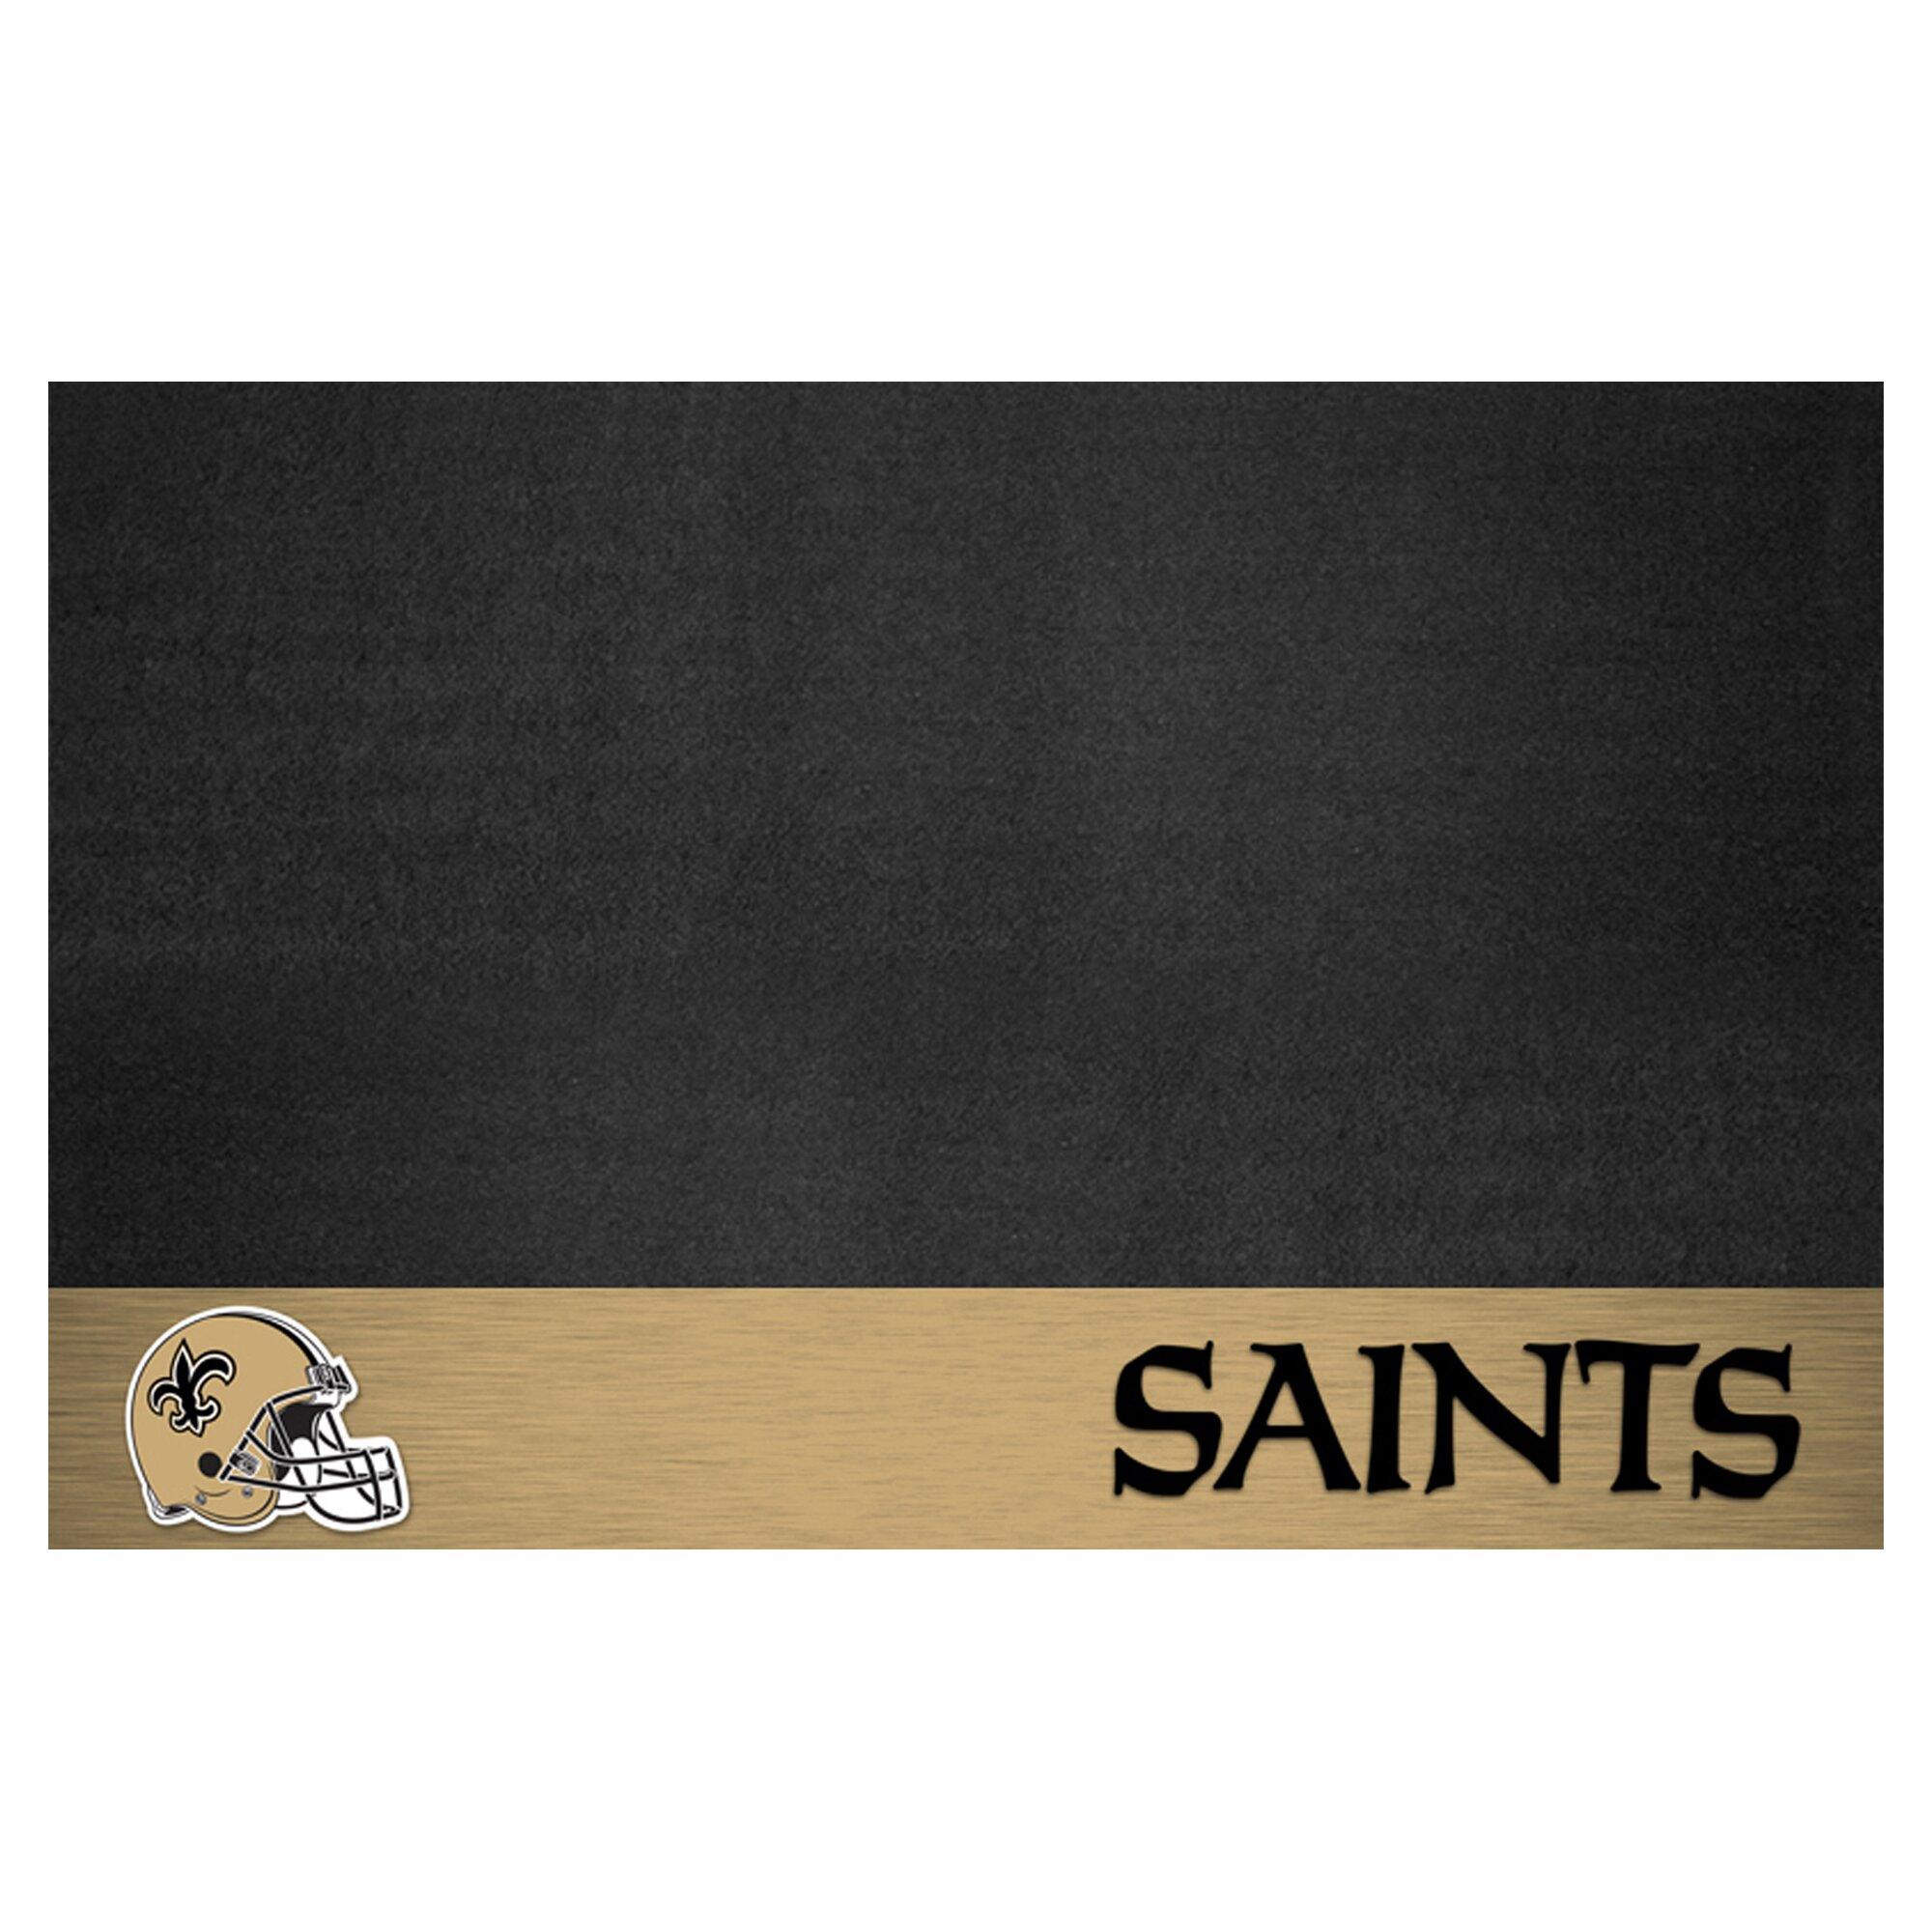 Fanmats Nfl New Orleans Saints Grill Mat Reviews Wayfair